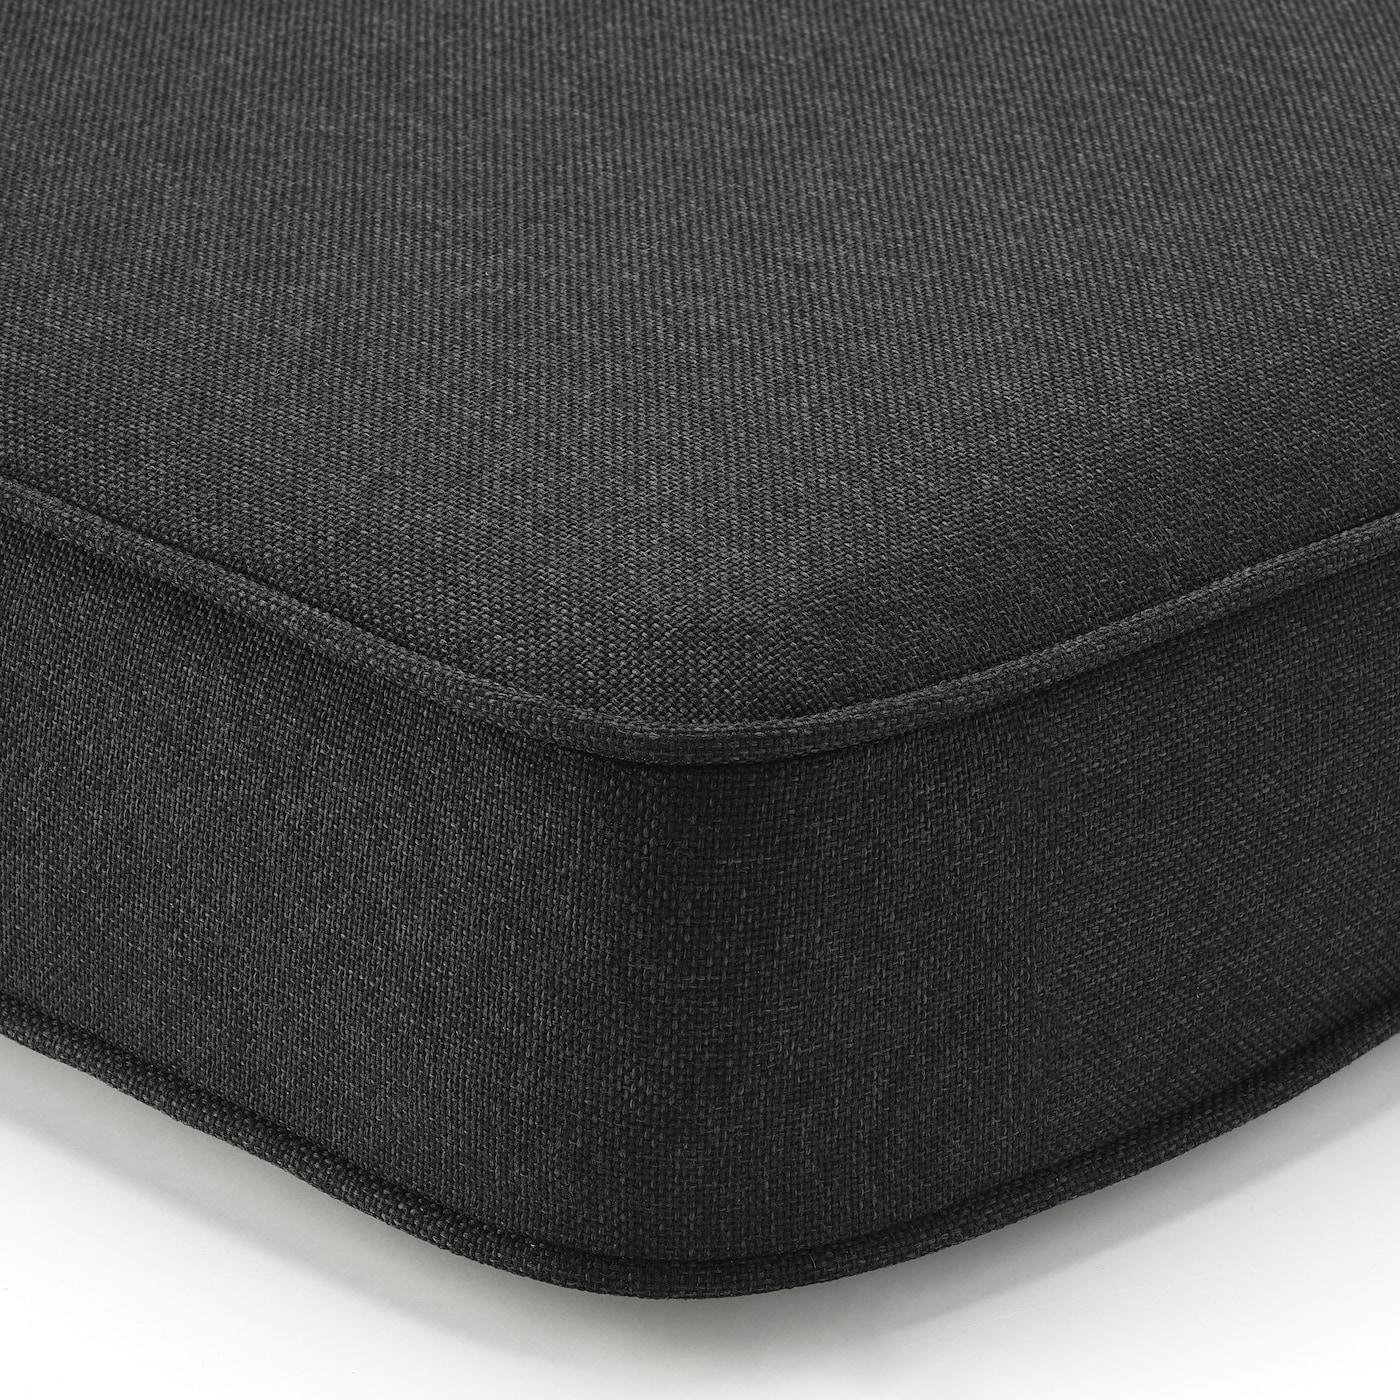 ÄPPLARÖ Modulopb. hjøsofa 3-pers., ude, brun bejdse/Järpön/Duvholmen antracit, 143/223x80x86 cm